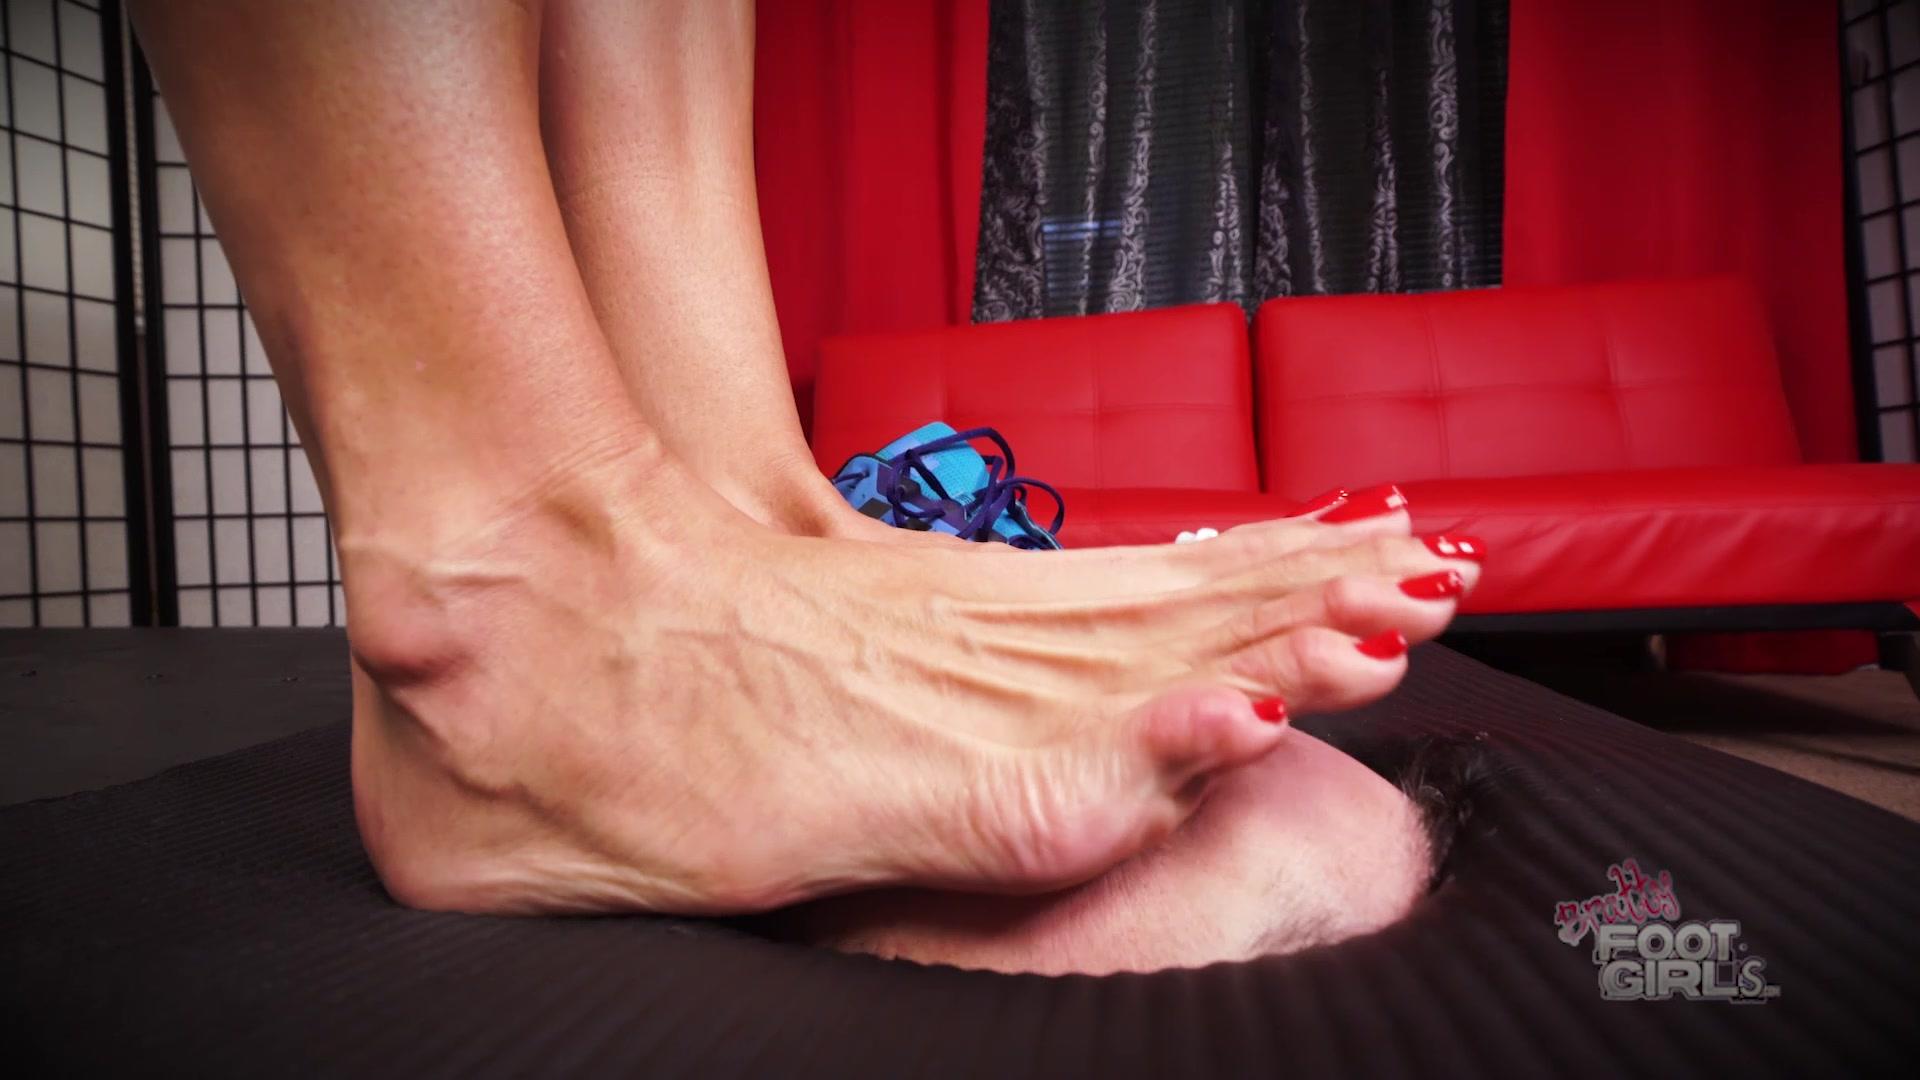 Lesbian Yoga Feet Worship